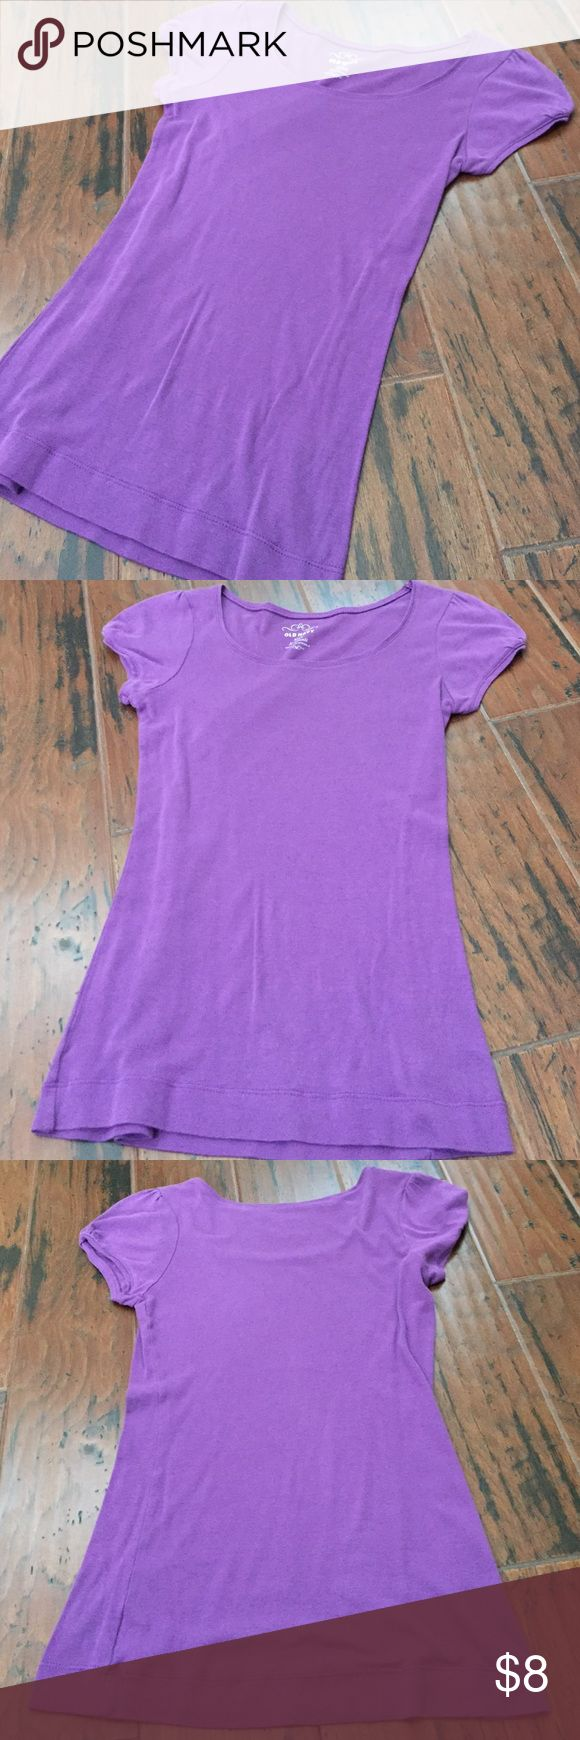 Purple tee Old navy purple tee in good condition Old Navy Tops Tees - Short Sleeve